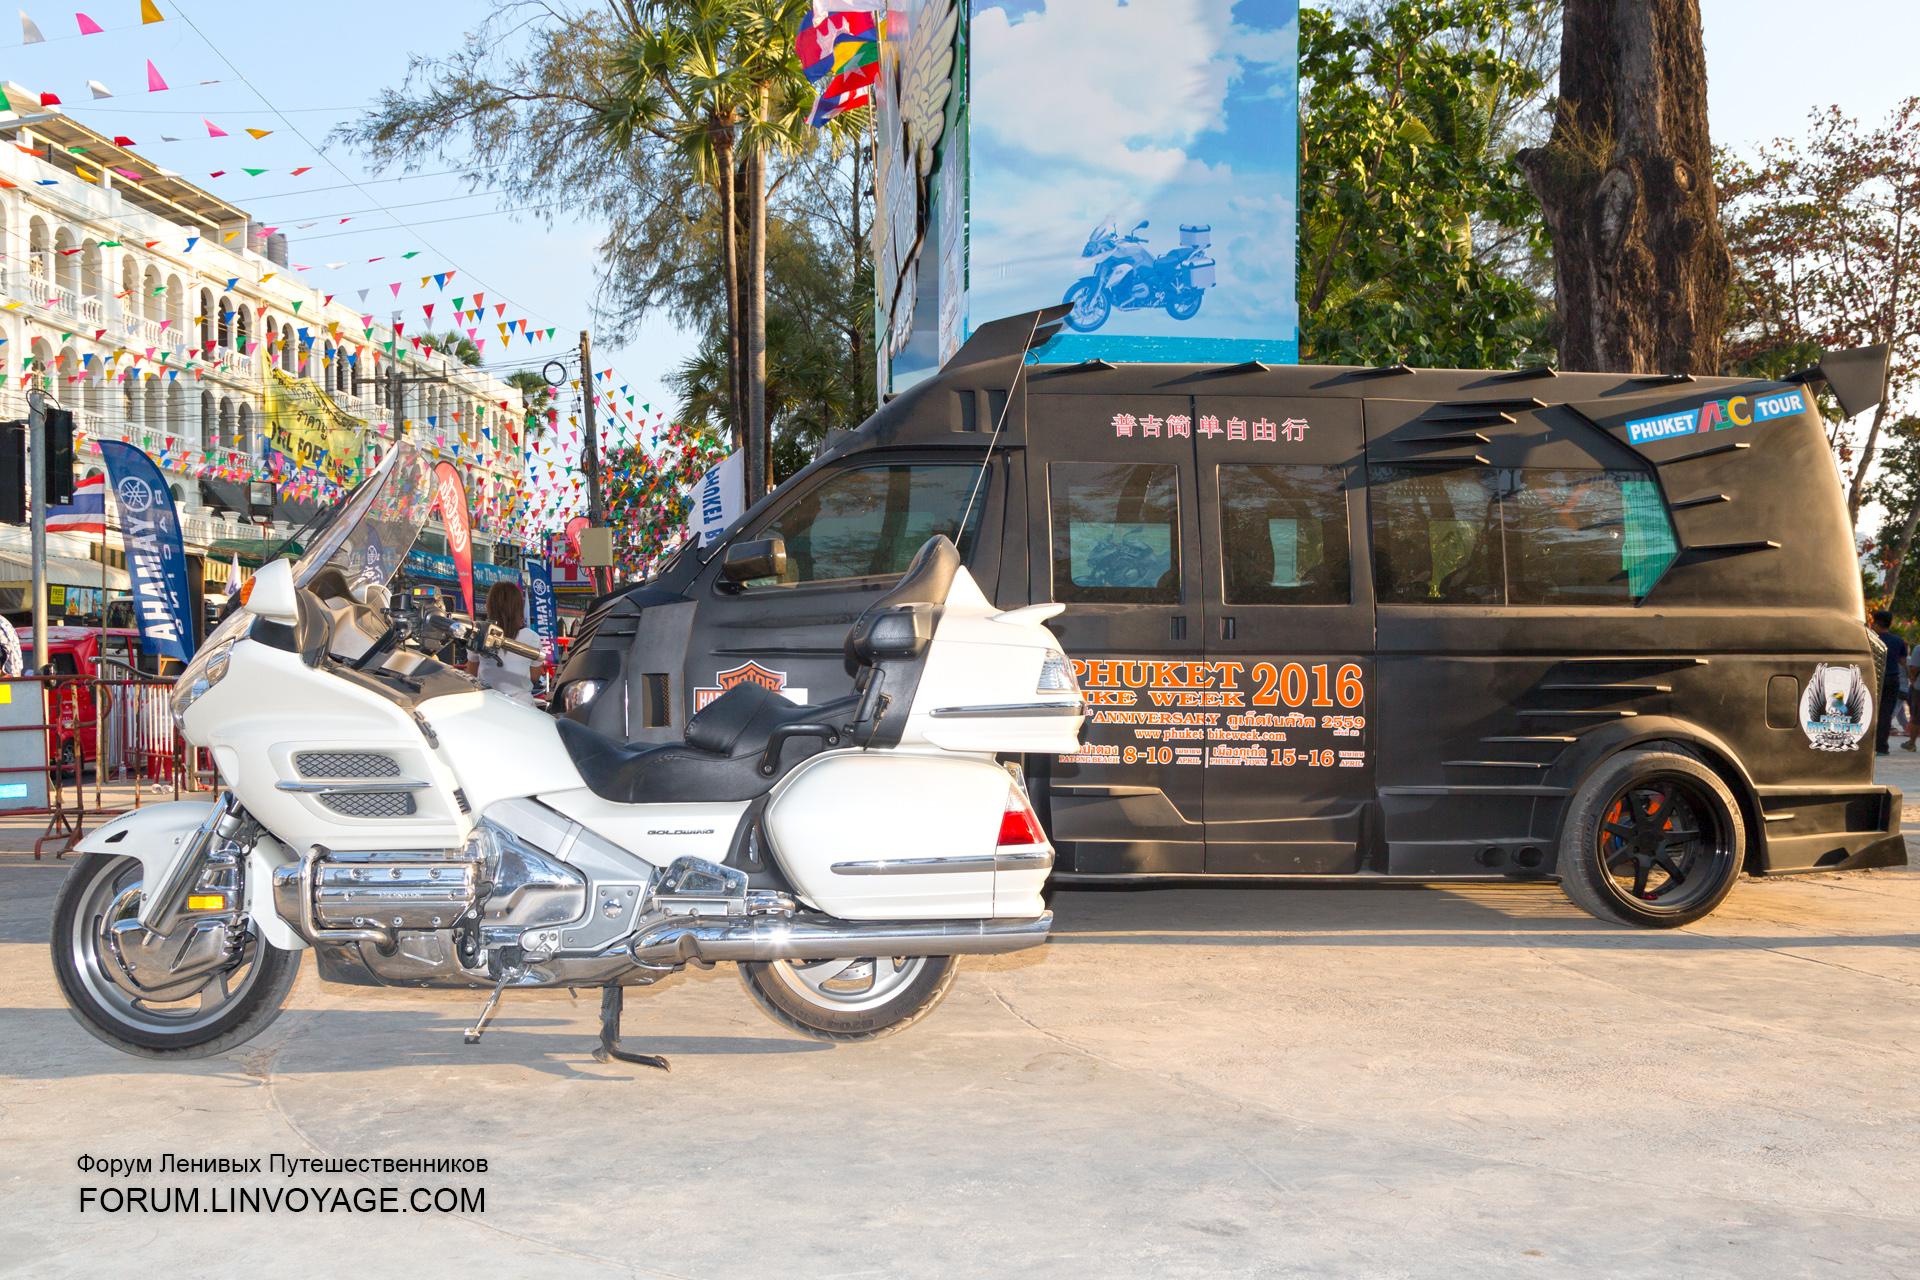 Wallpaper : black, old, car, motorcycle, vehicle, music